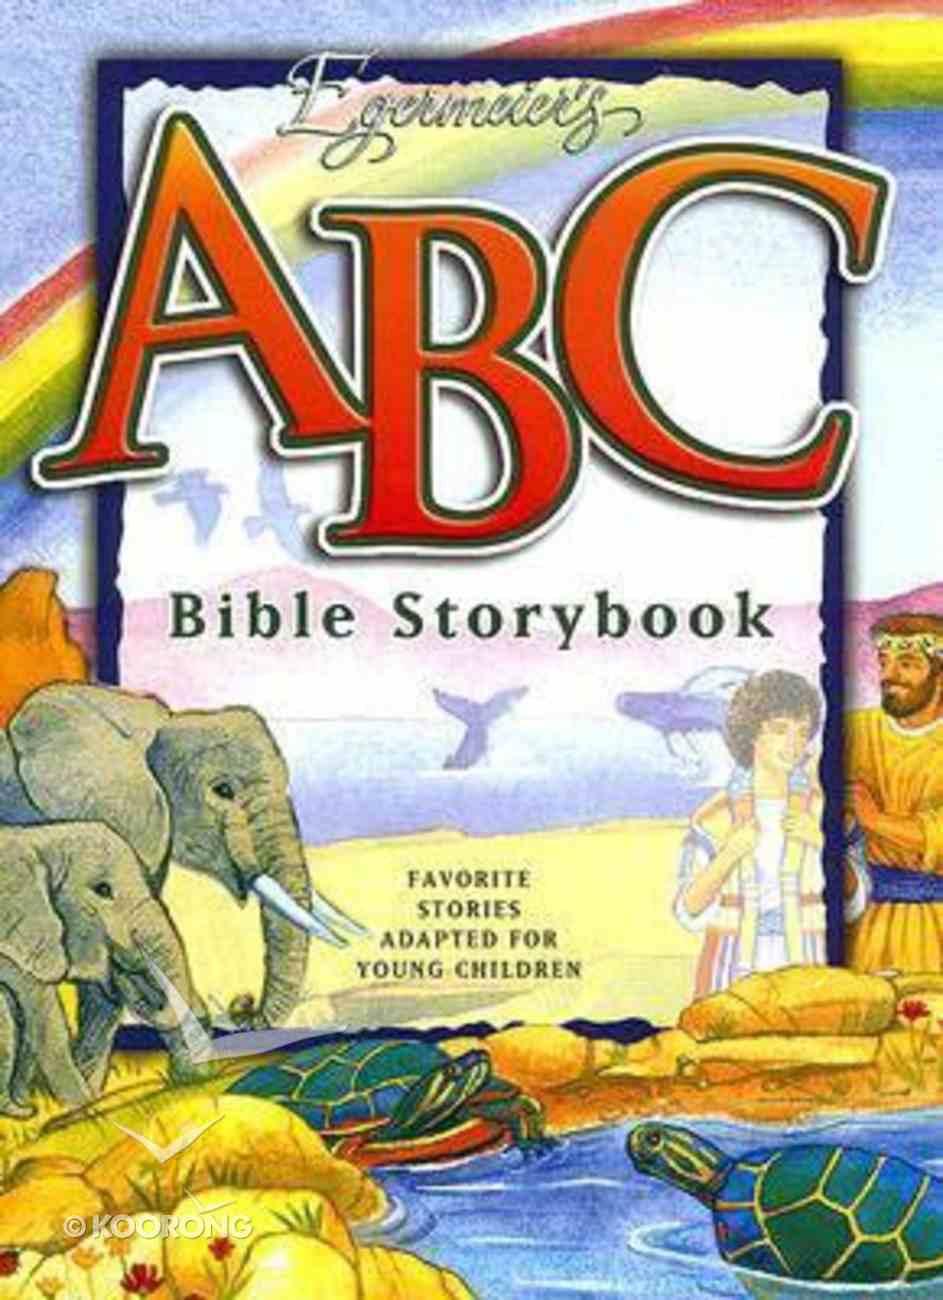 Egermeier's ABC Bible Storybook With CD Hardback